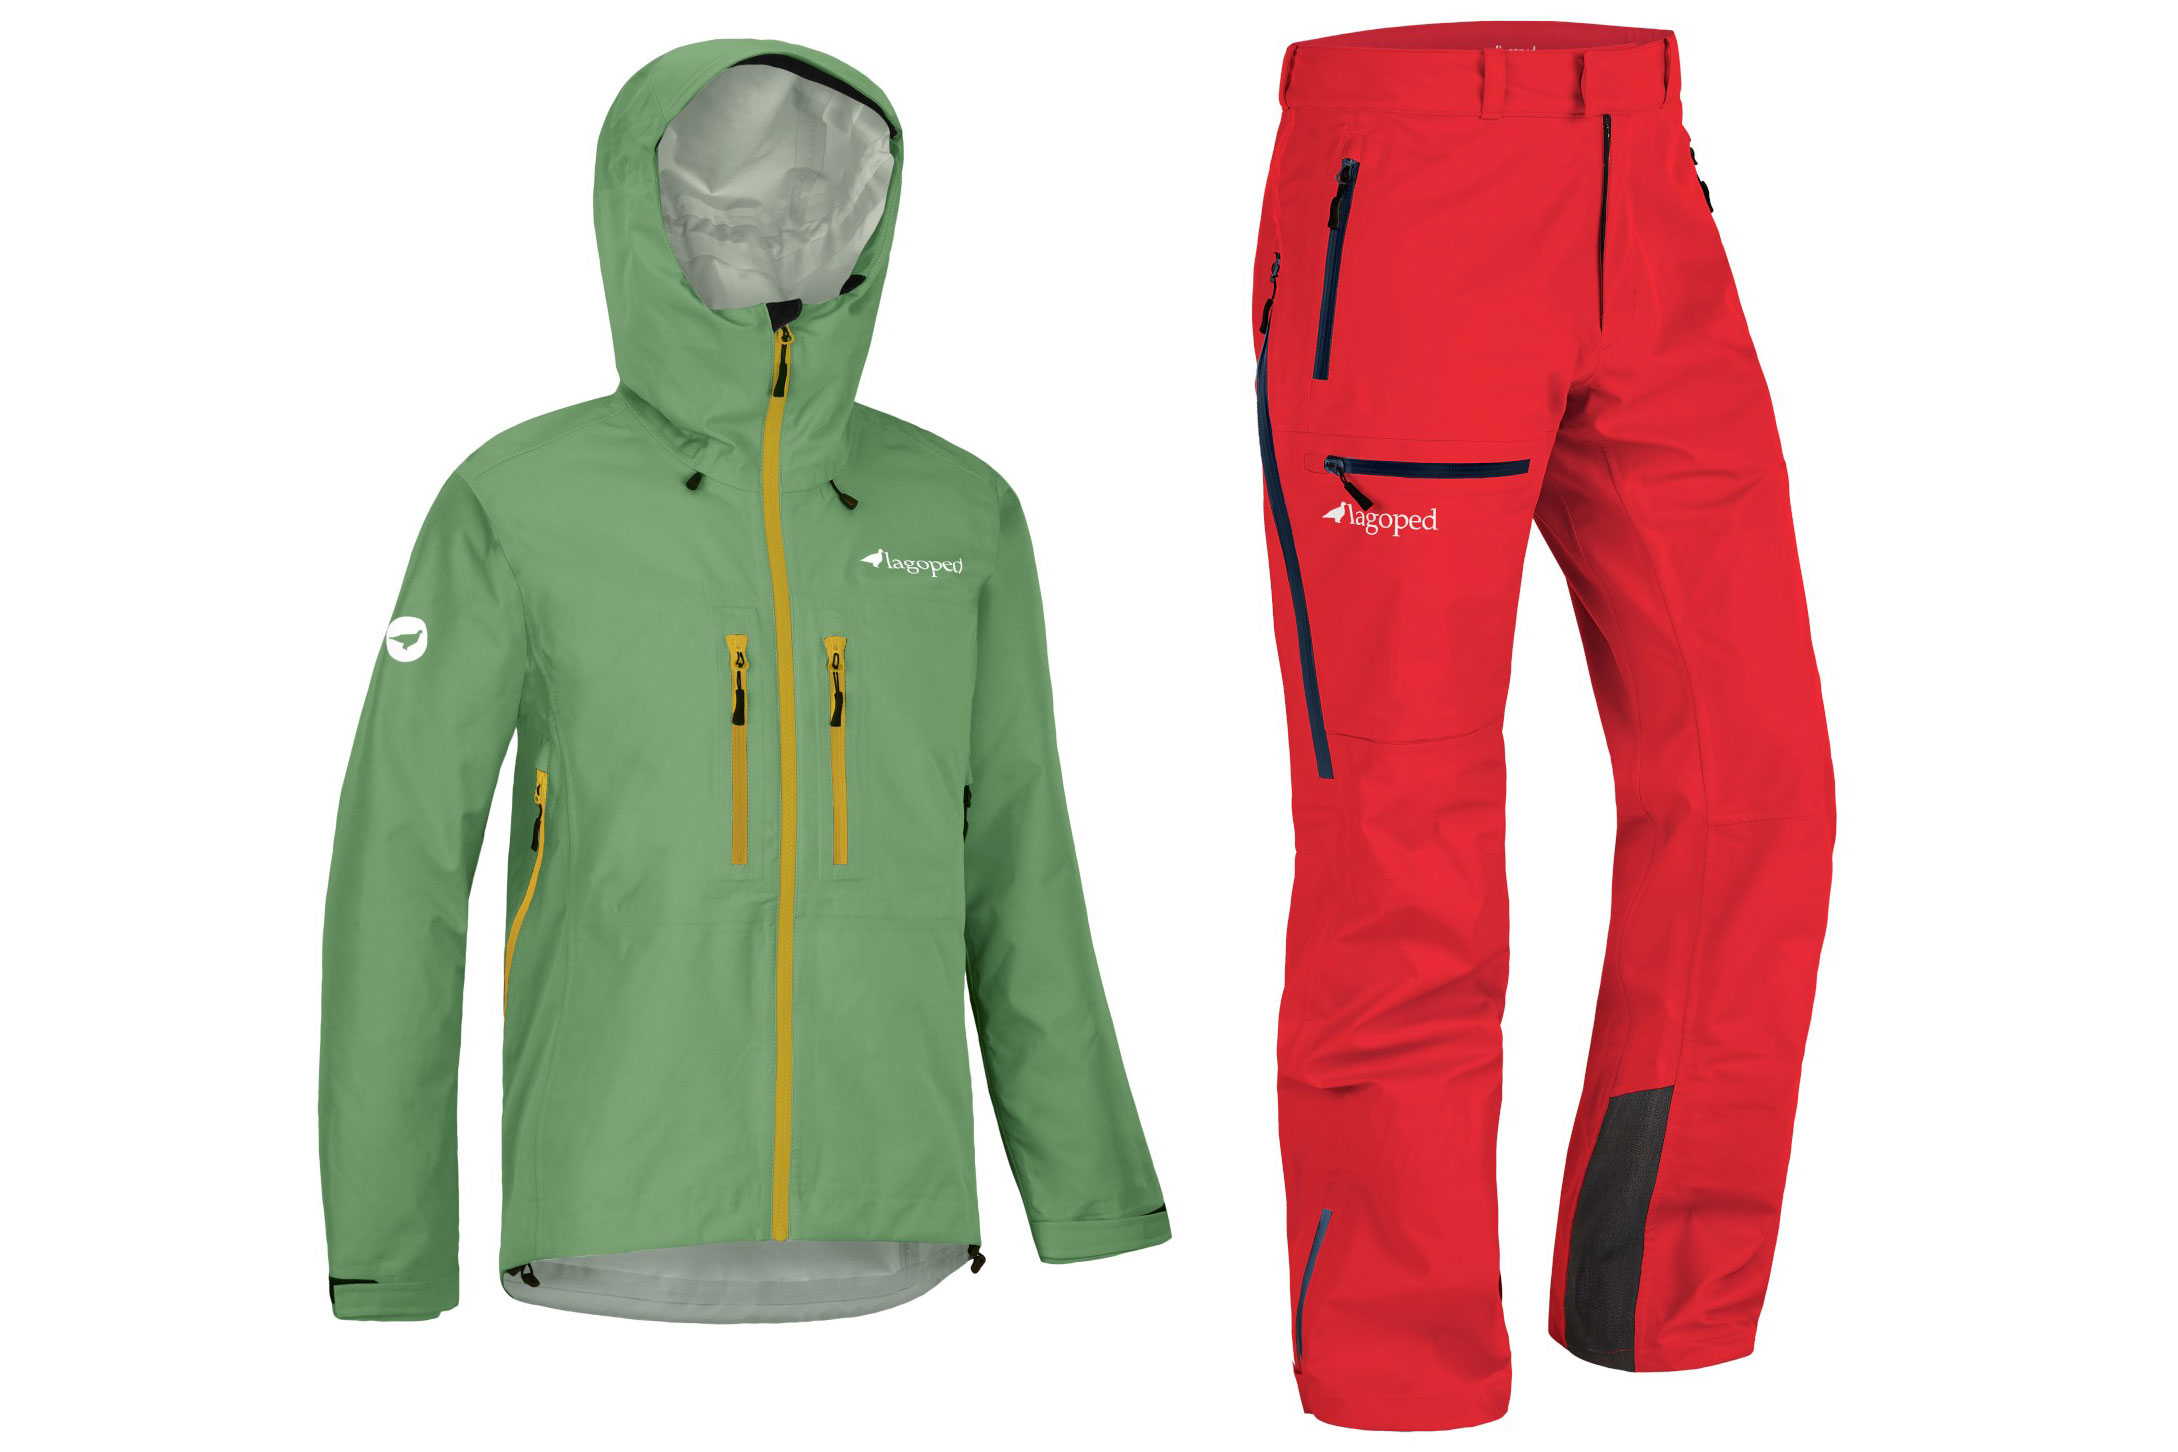 Lagoped Supa Pants and EVA jacket